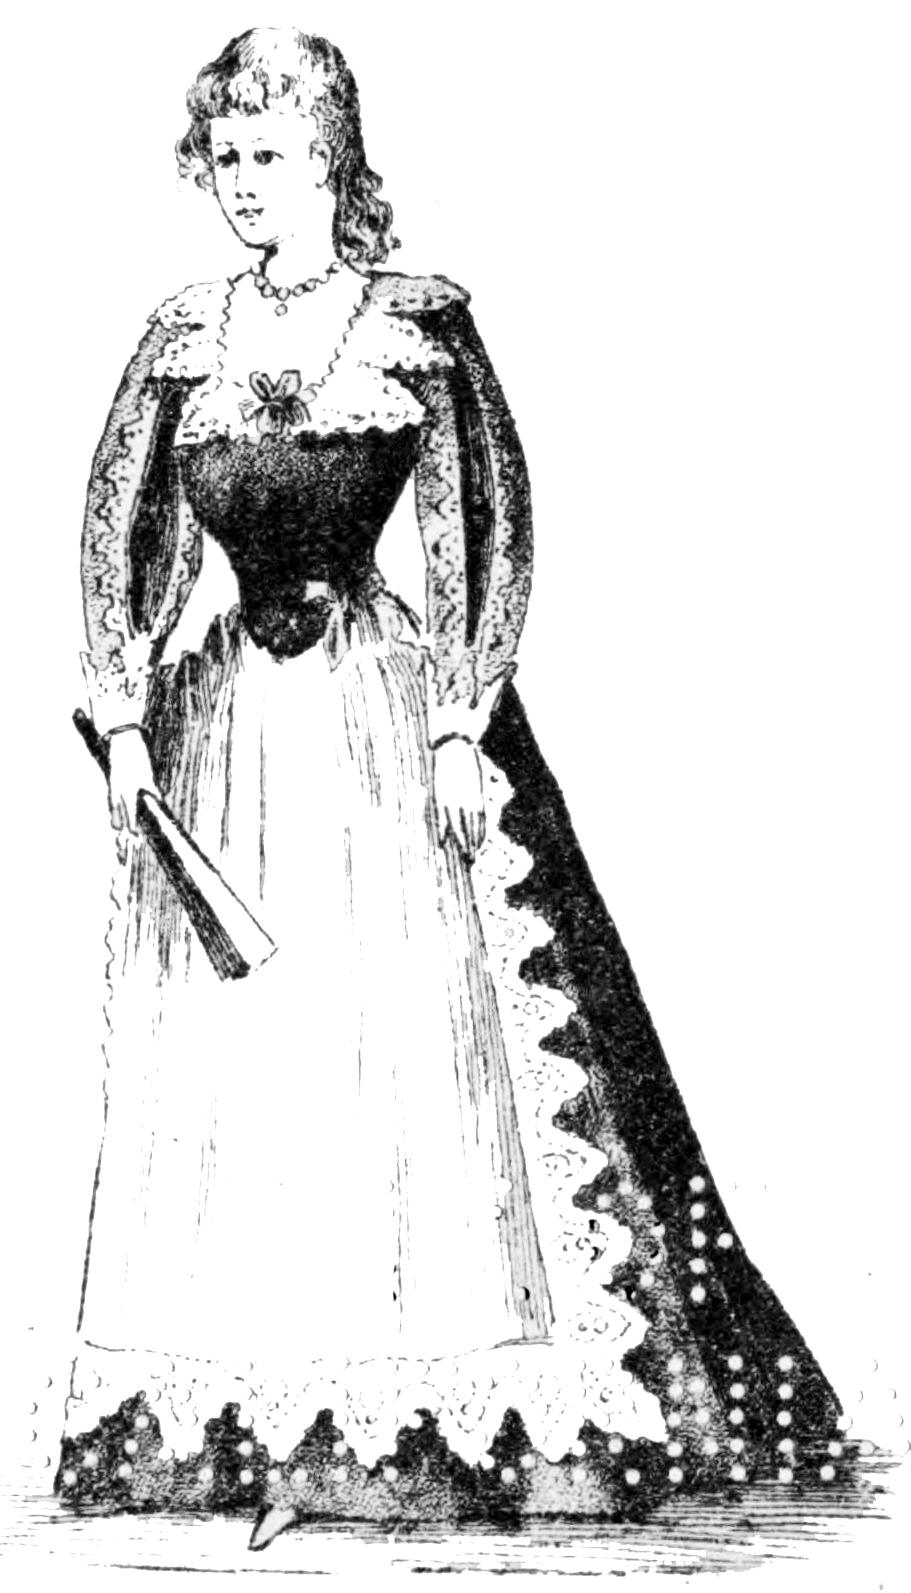 FIG Van Dress